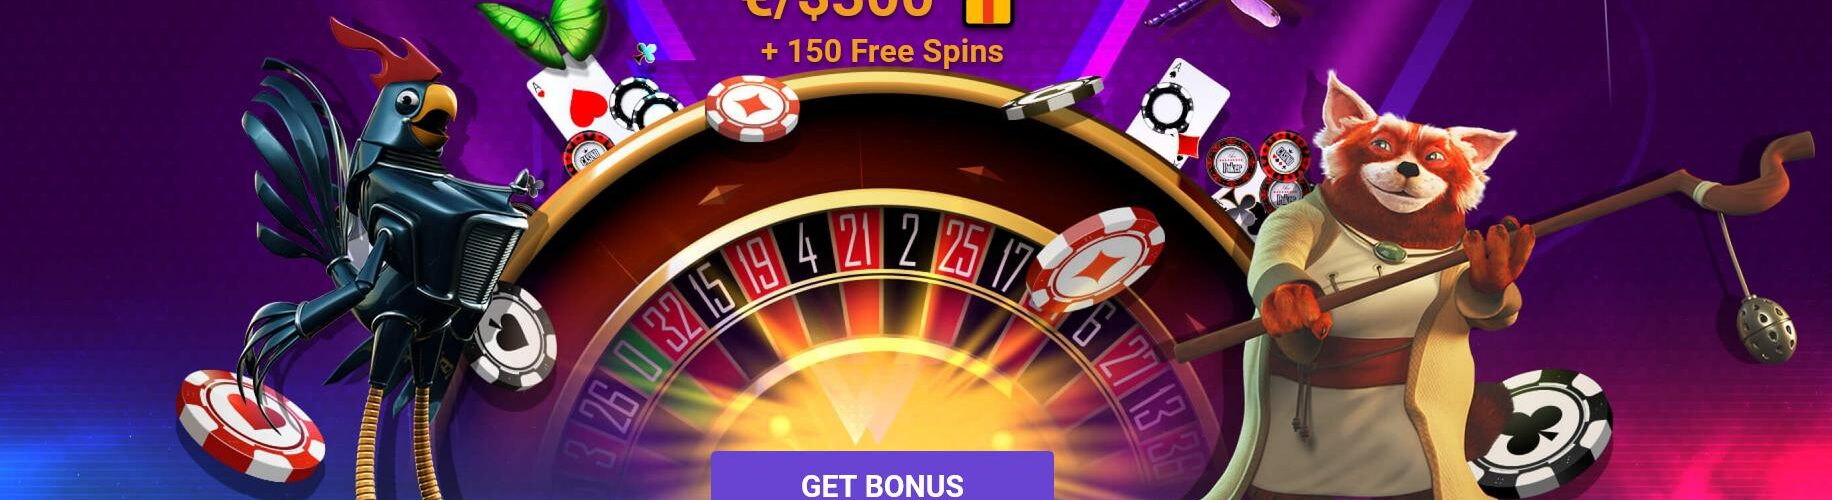 iLUCKI Online Casino